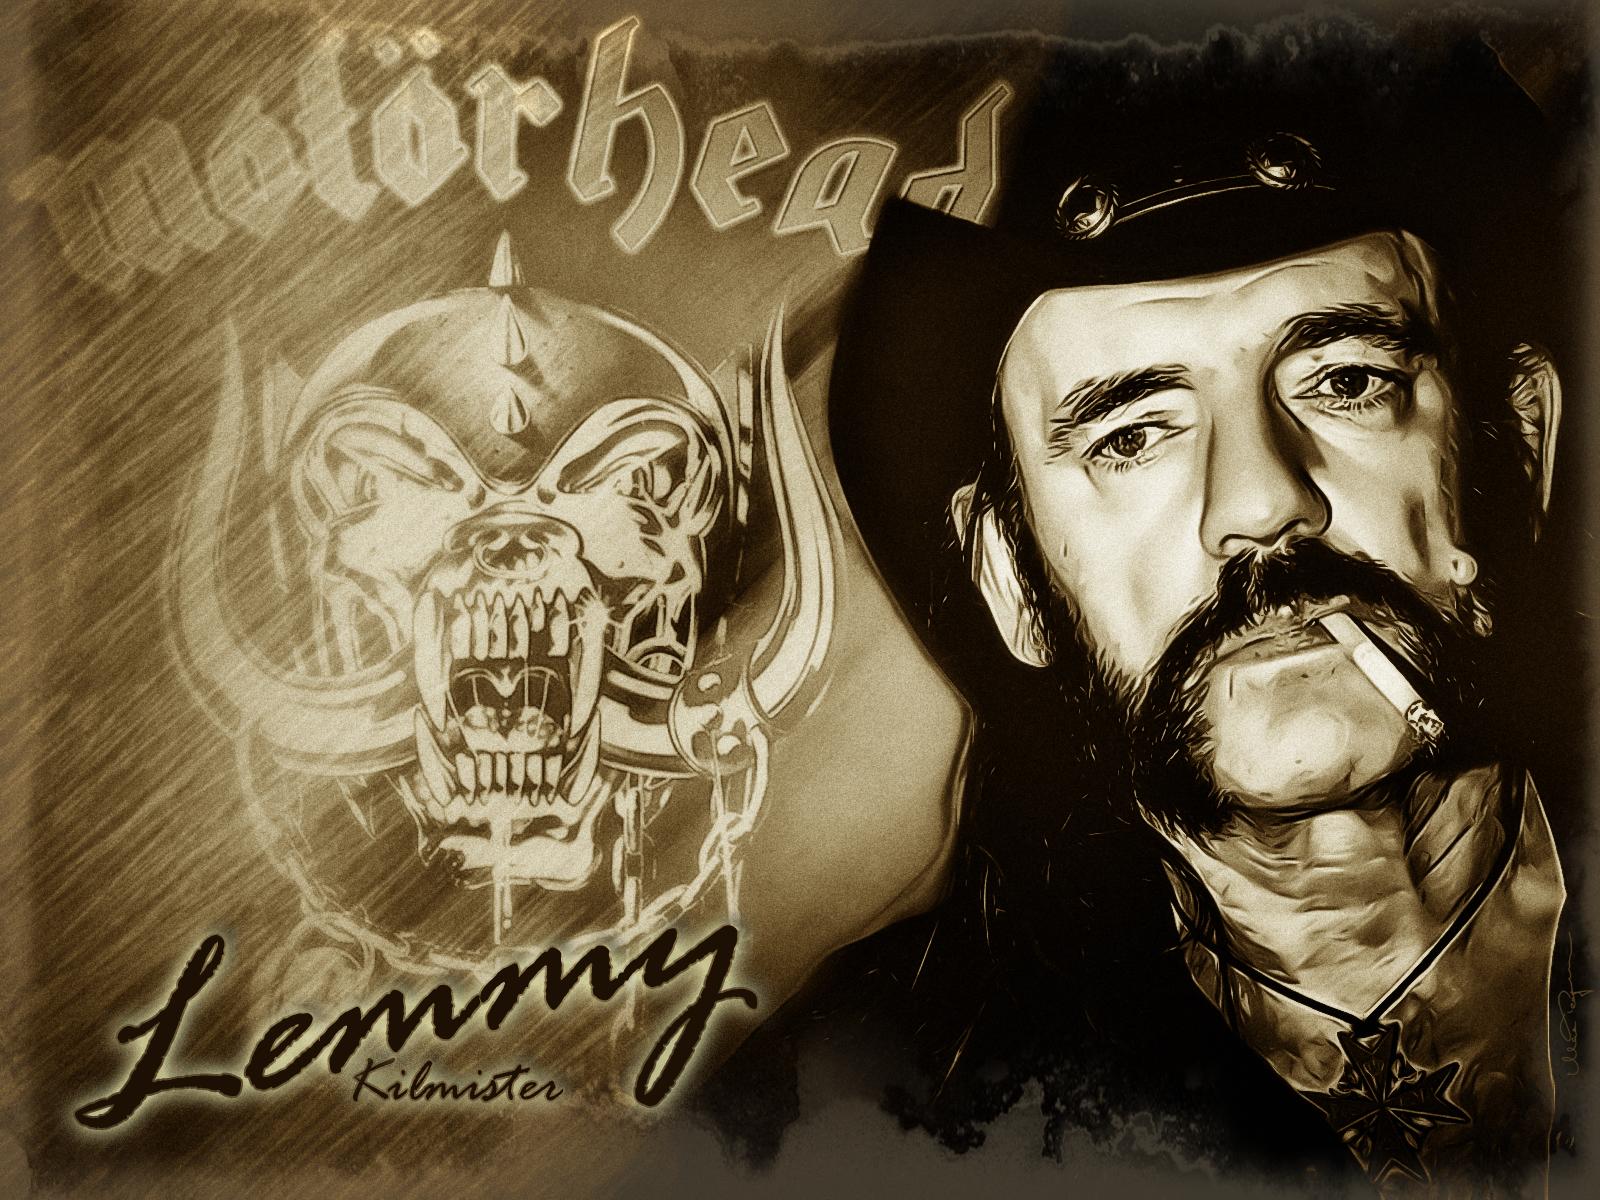 Lemmy Kilmister Rock Music Motorhead Wallpaper Hd: WallpaperSafari